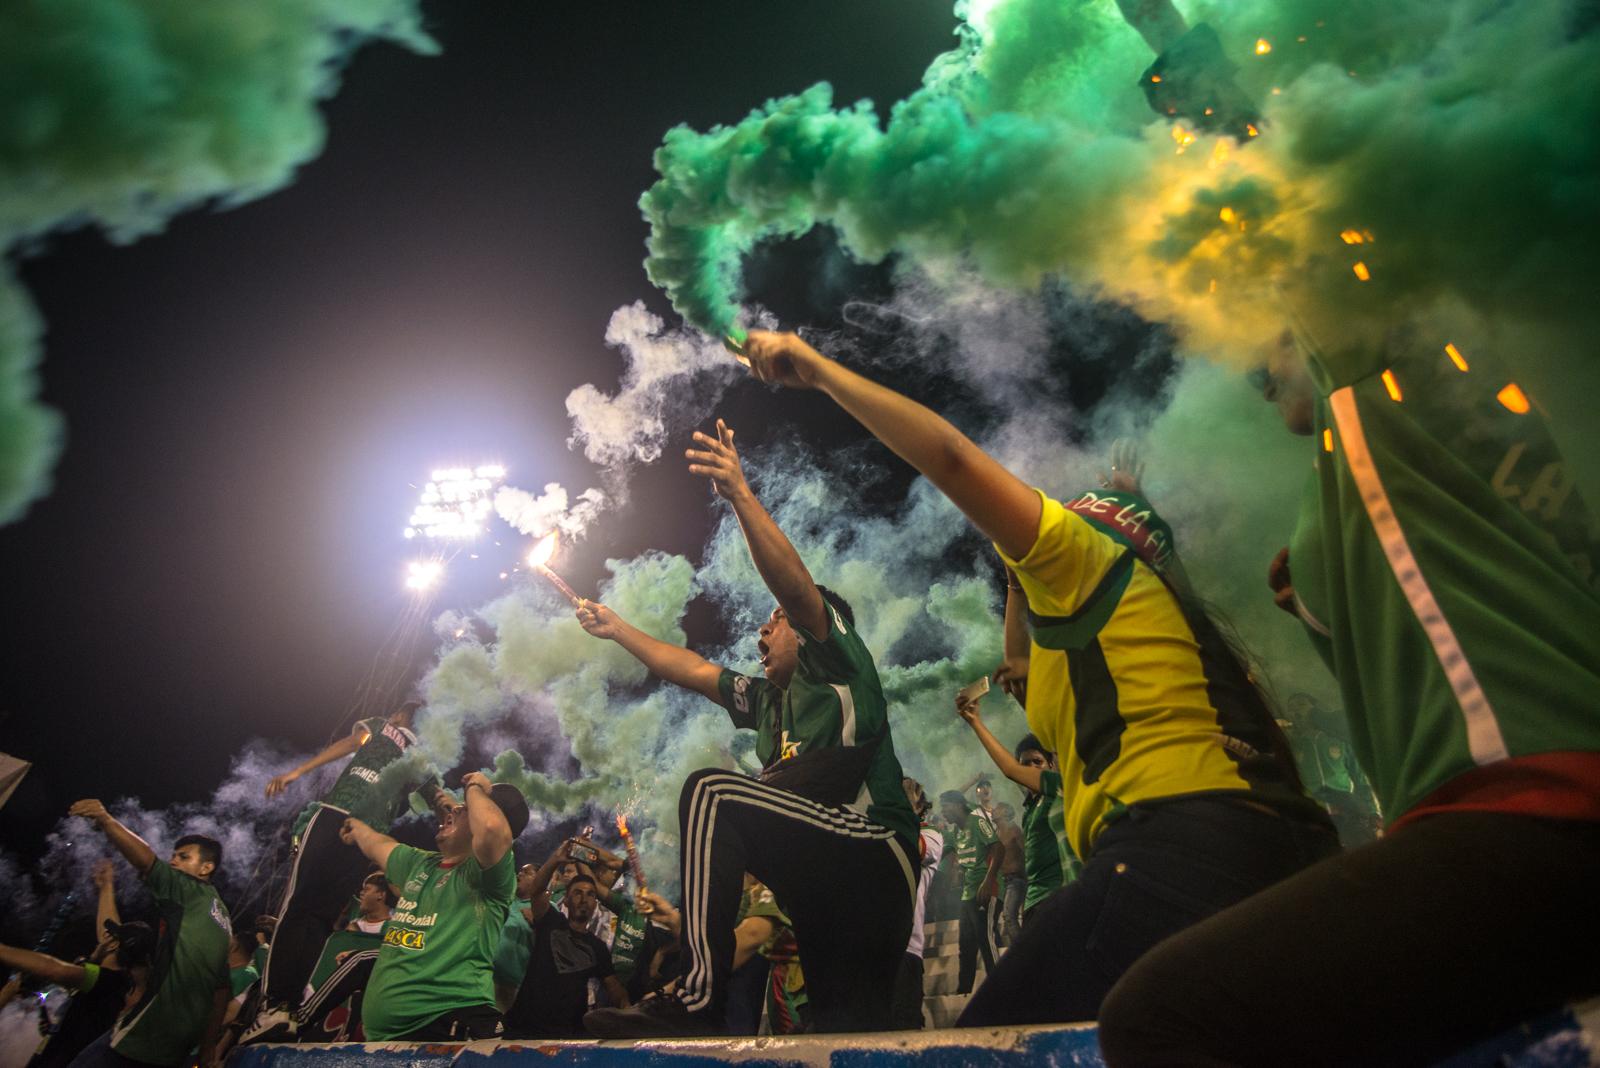 Vamos Mi Verde - A series about superfans in San Pedro Sula, Honduras.